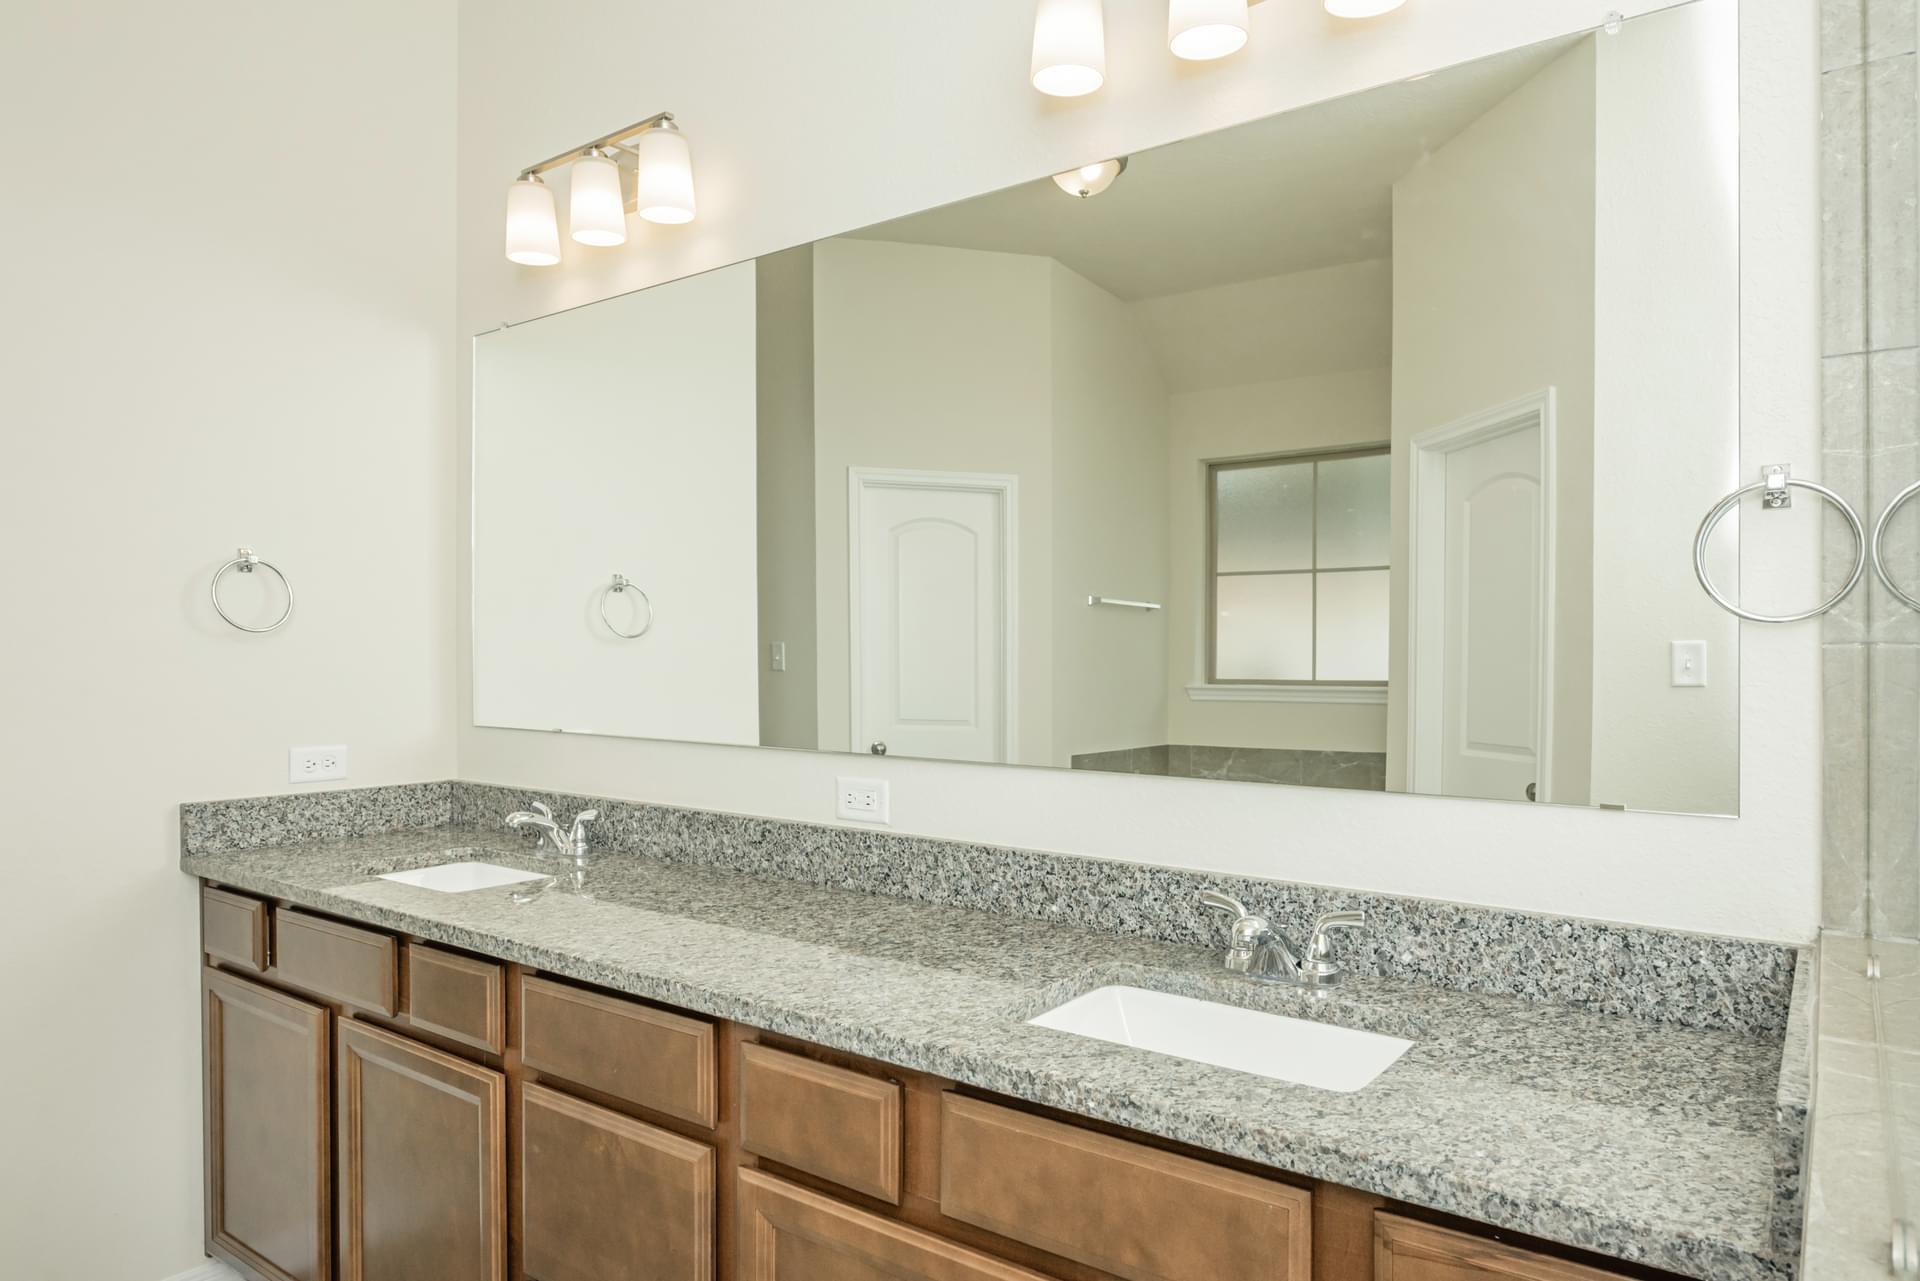 1,846sf New Home in Bryan, TX